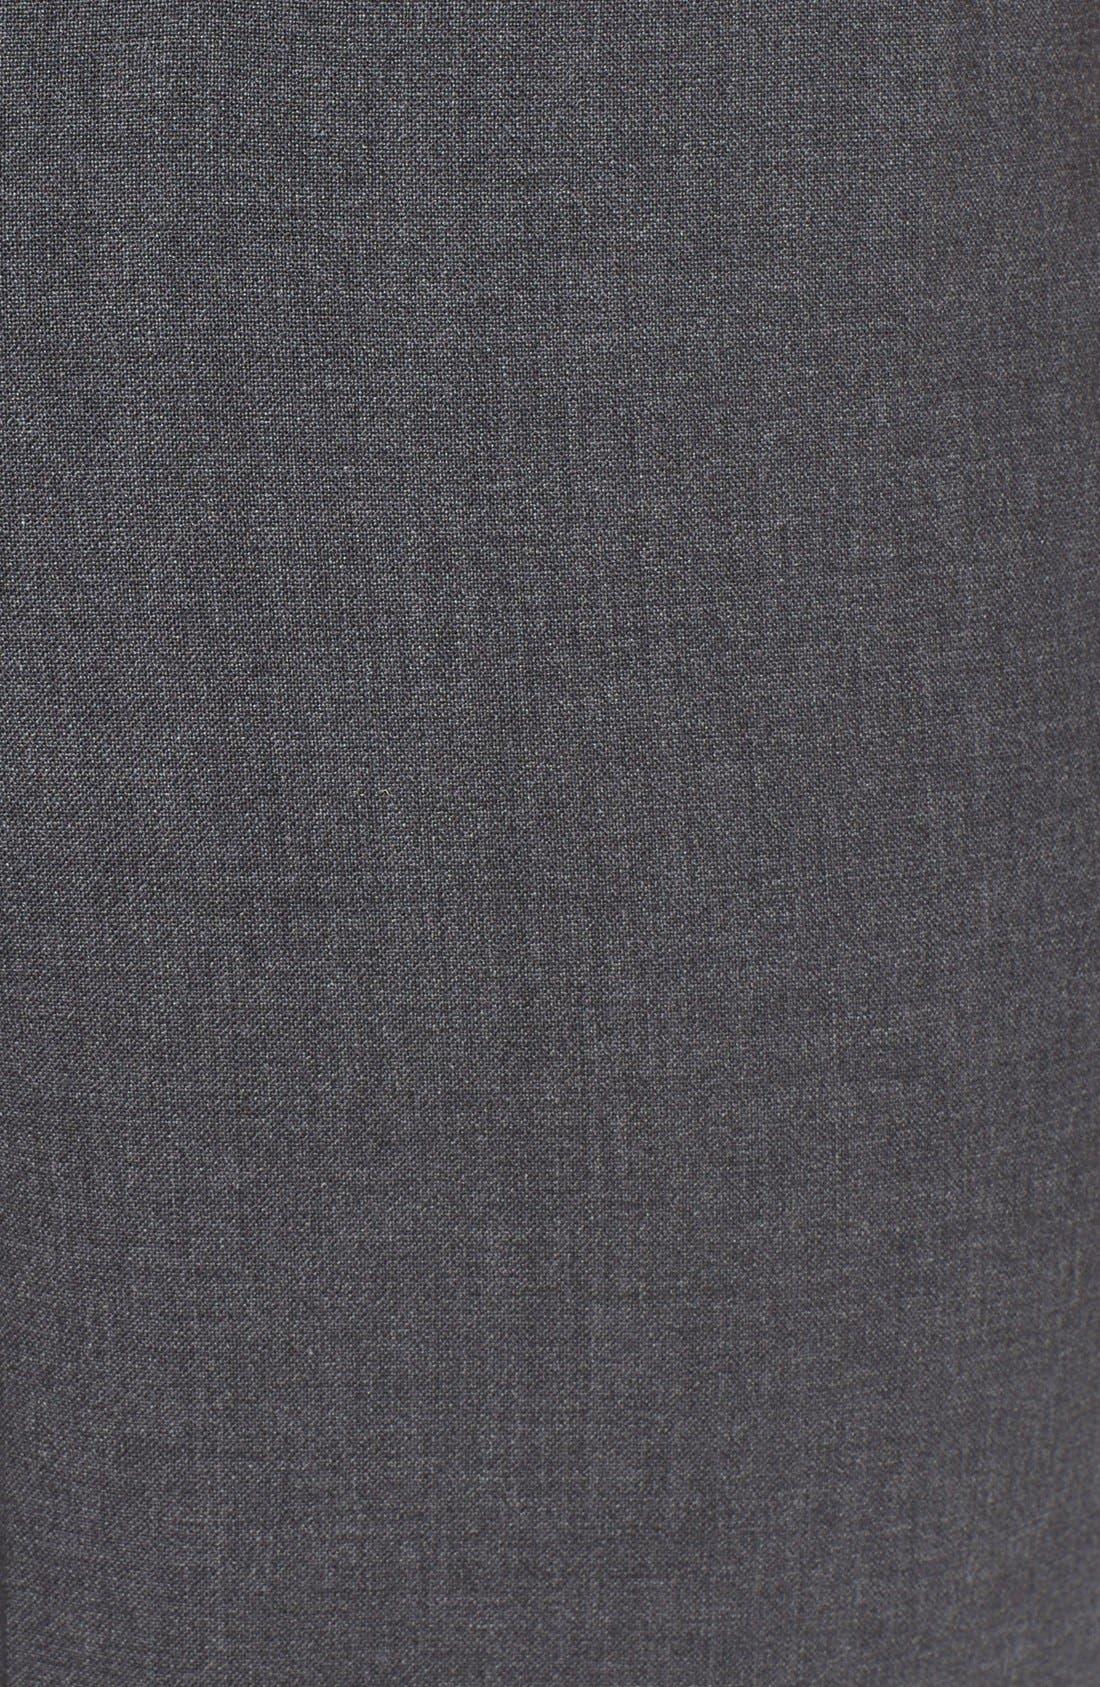 Testra 2B Stretch Wool Pants,                             Alternate thumbnail 3, color,                             020